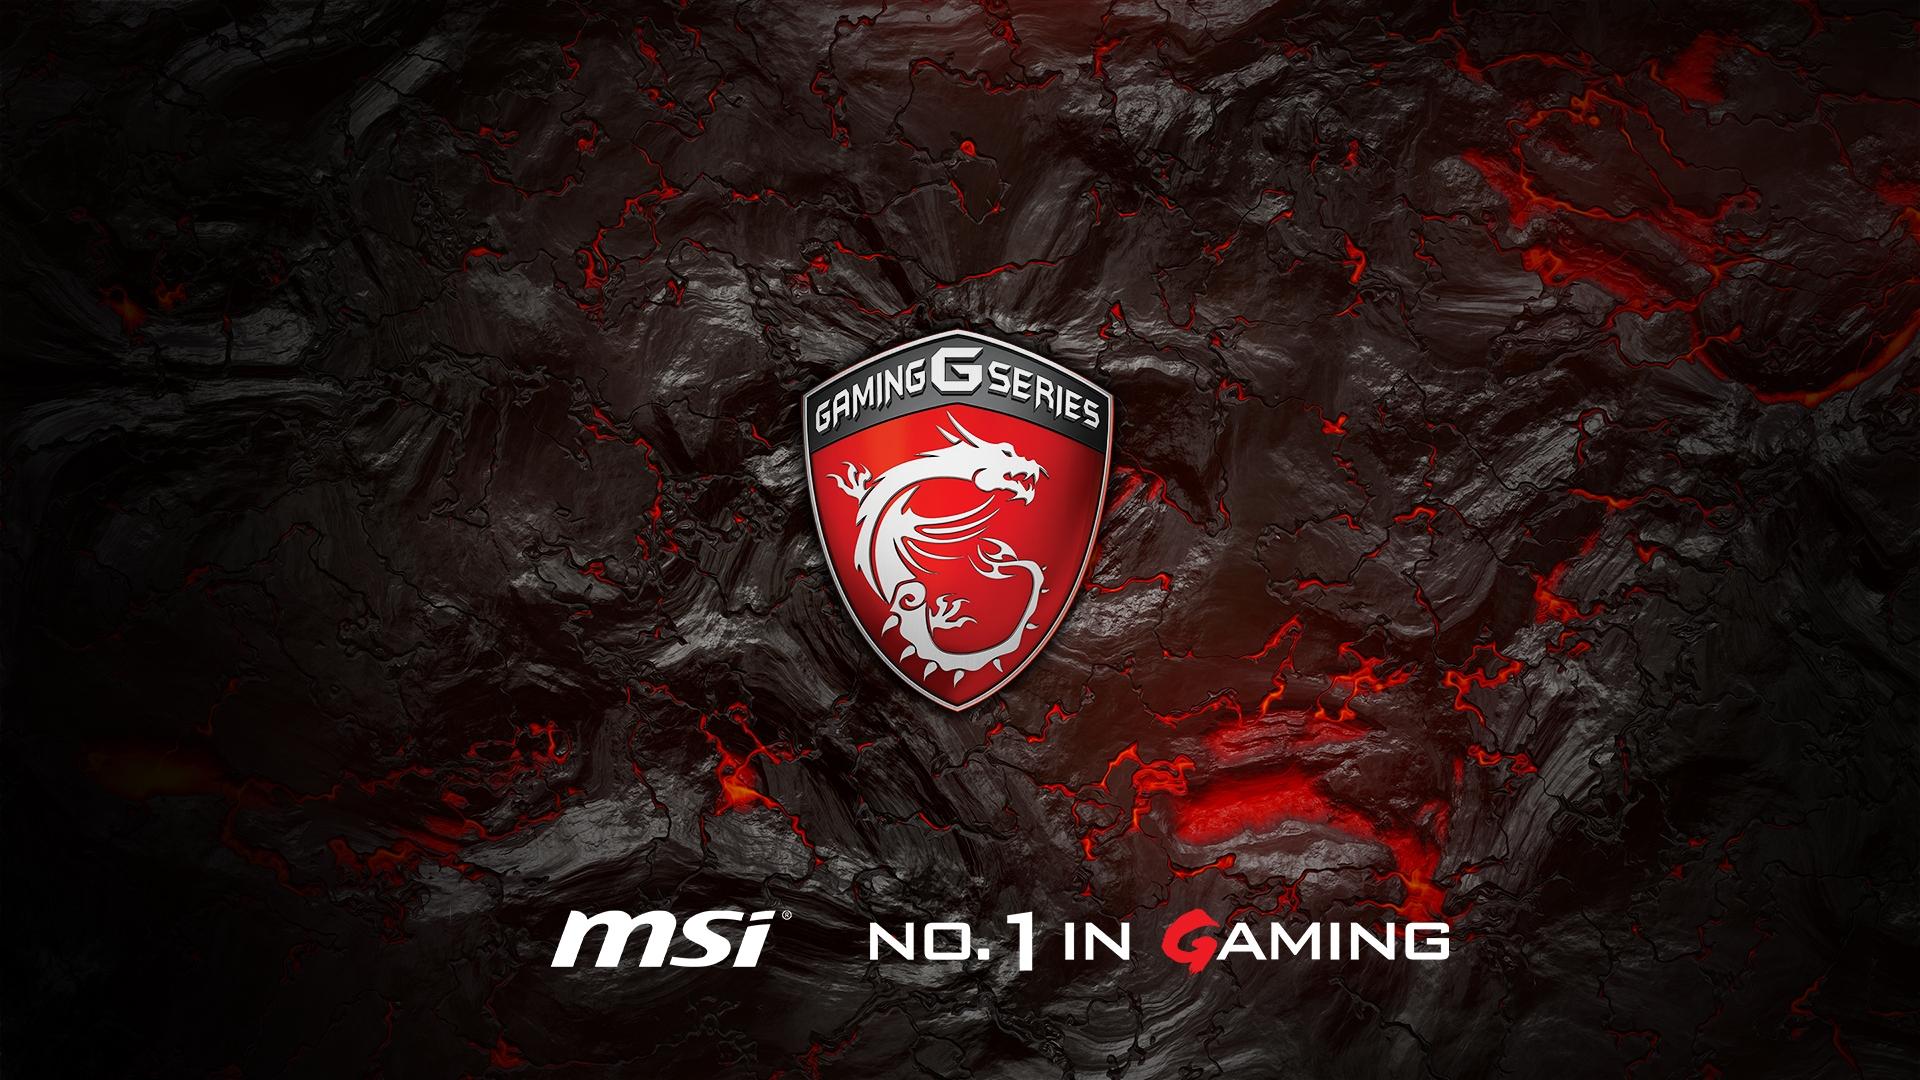 Msi announces sponsorship program for gaming teams - Gaming logo wallpaper ...